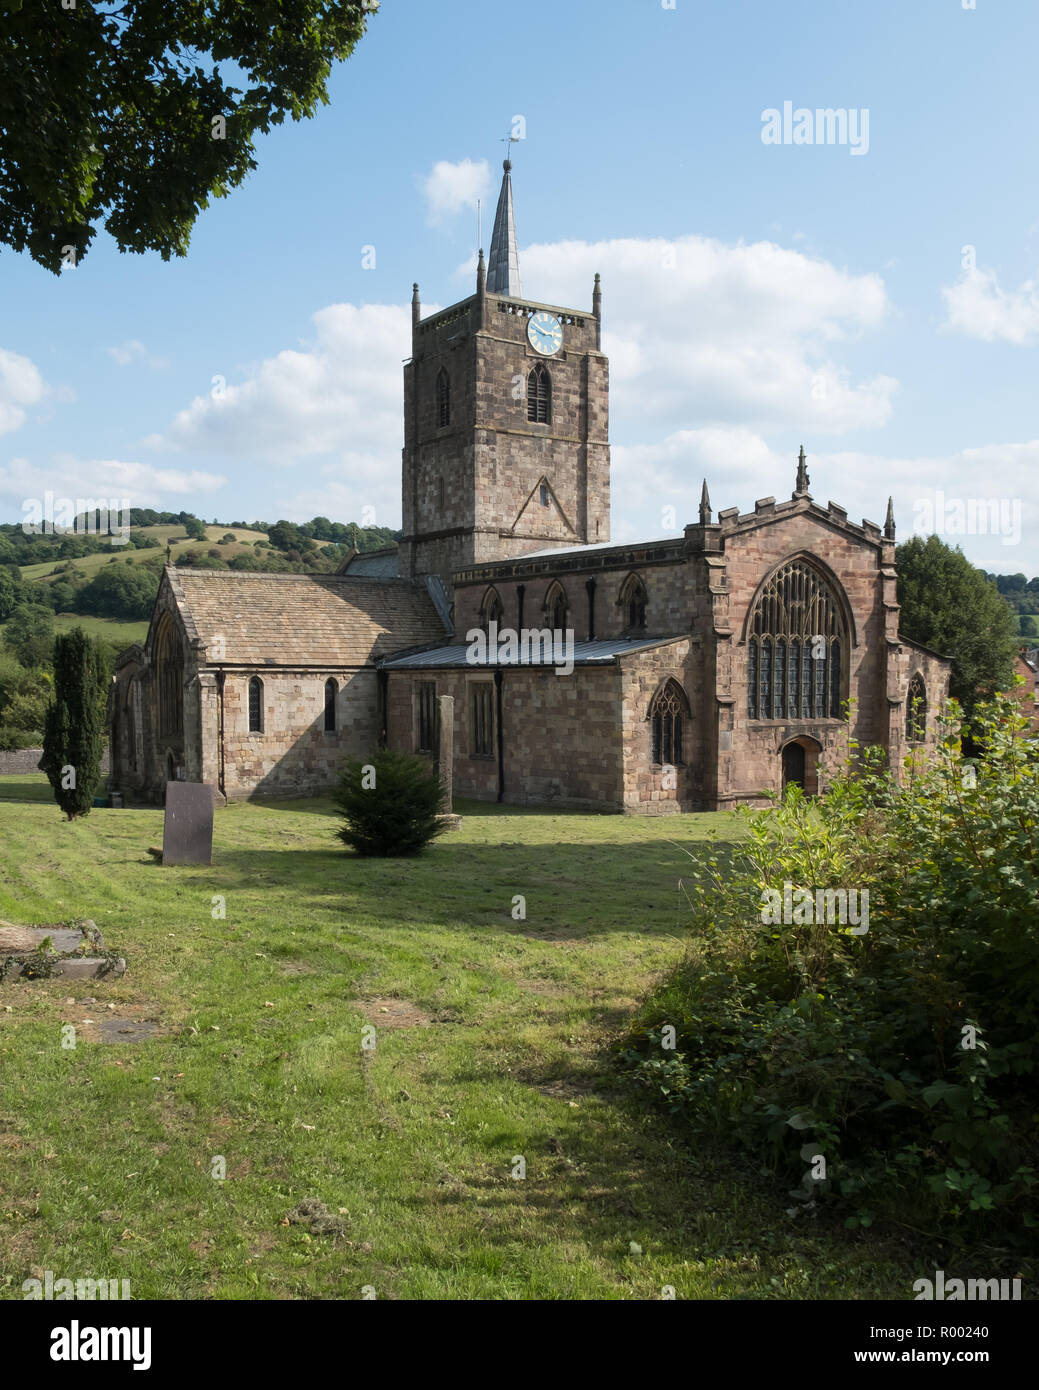 Wirksworth church, Derbyshire, UK - Stock Image